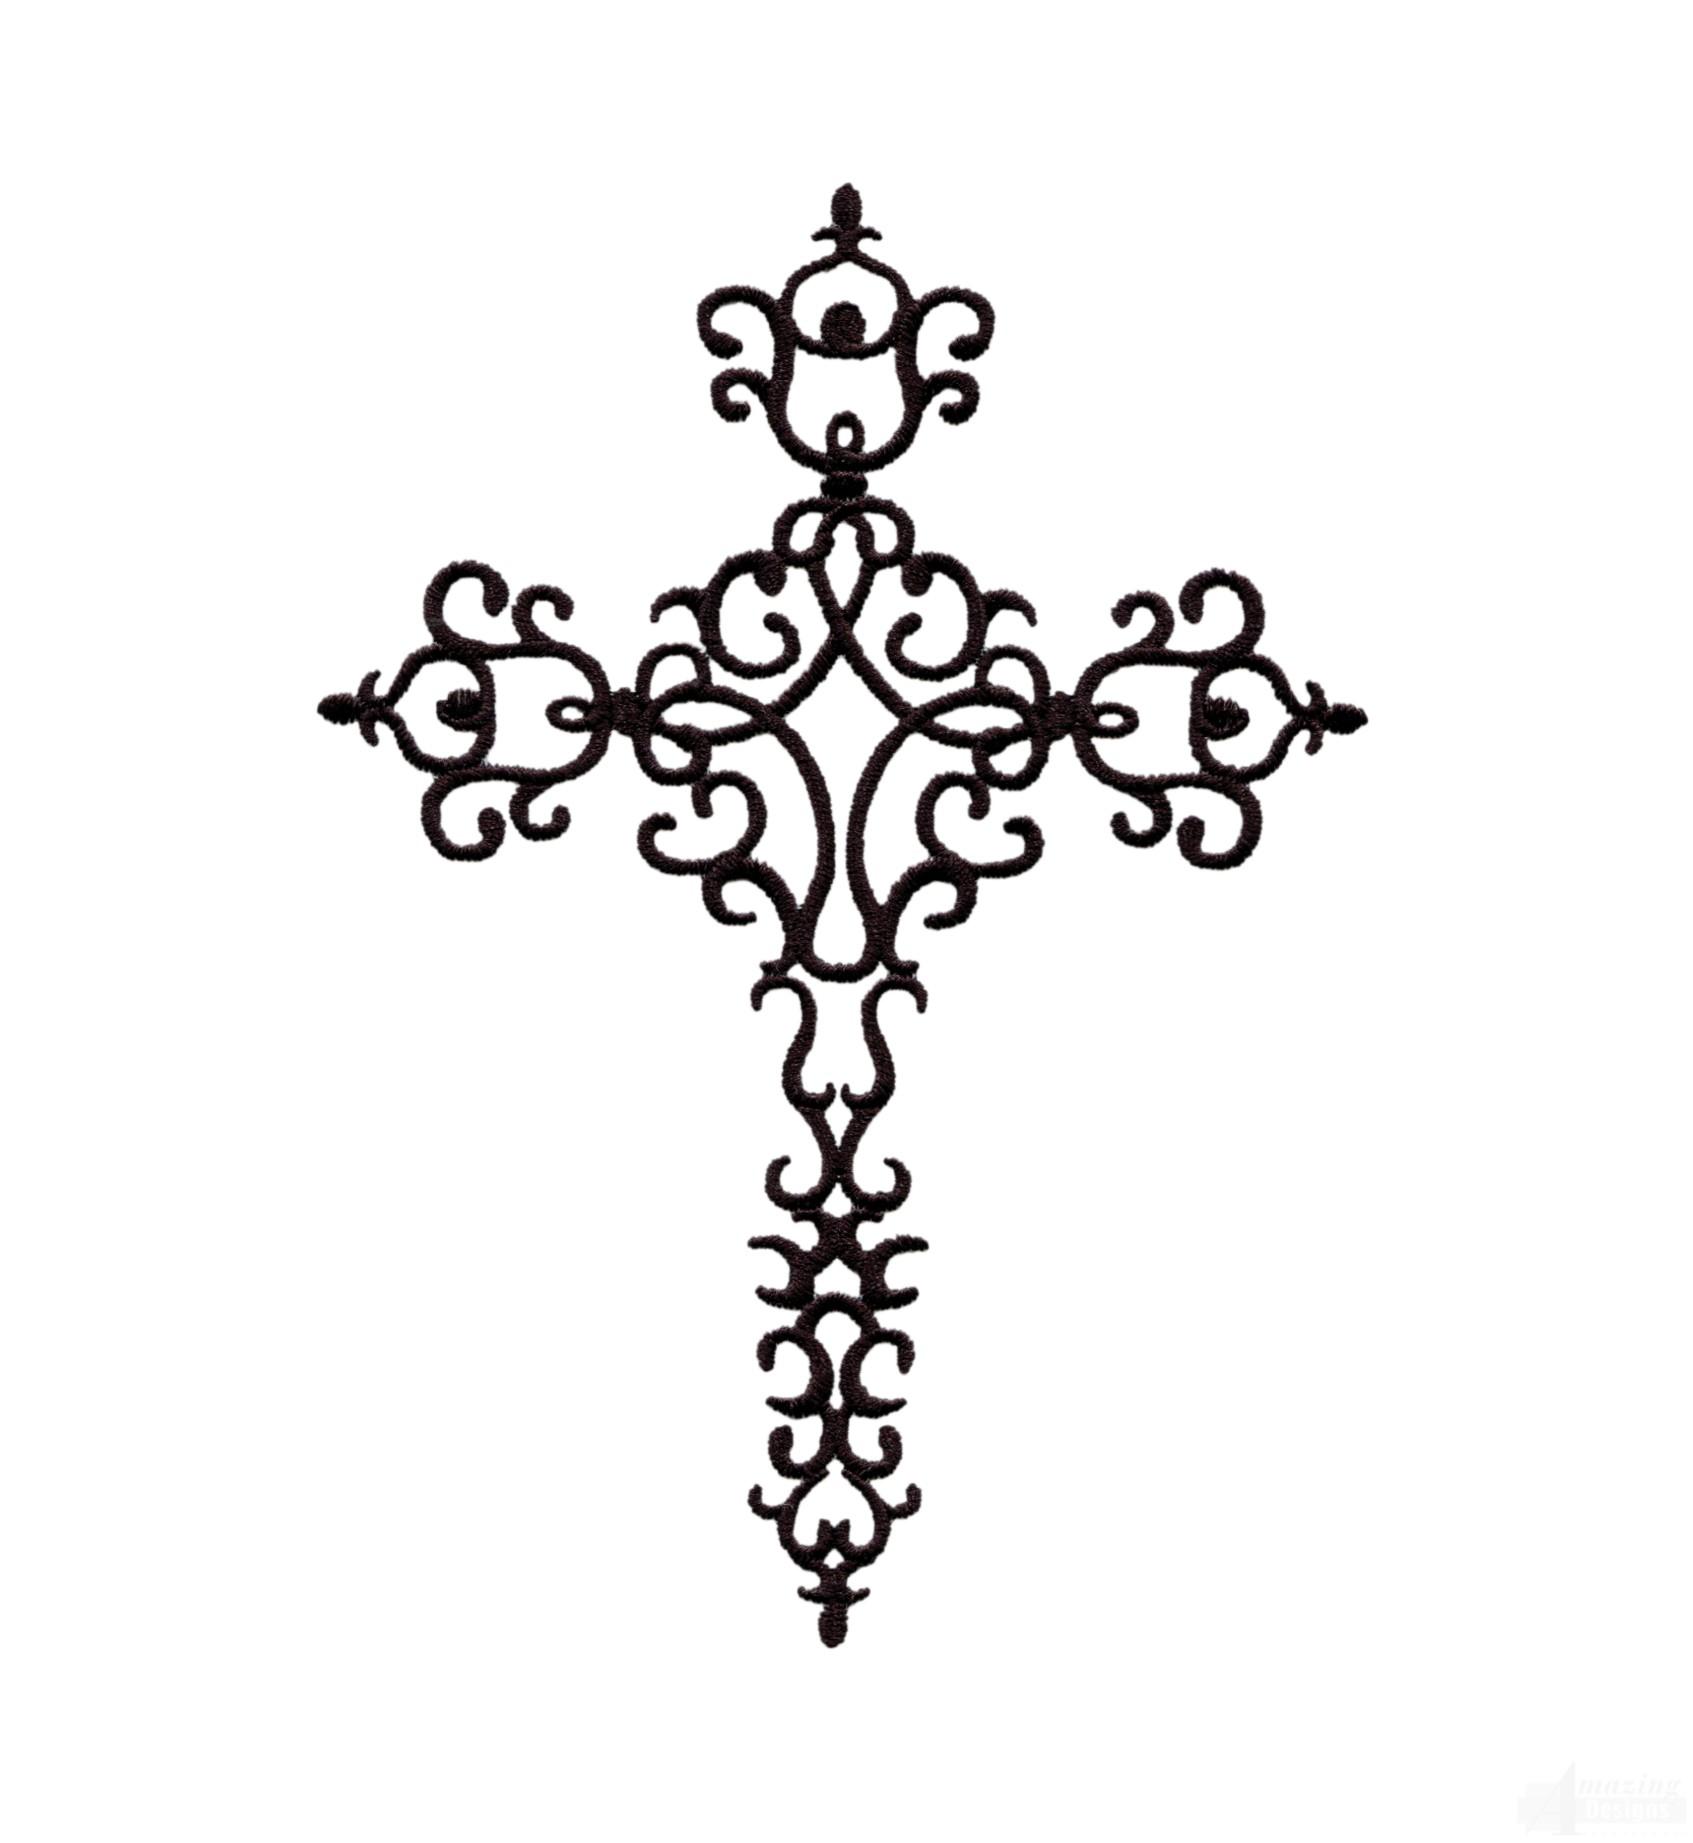 Easter Cross Image